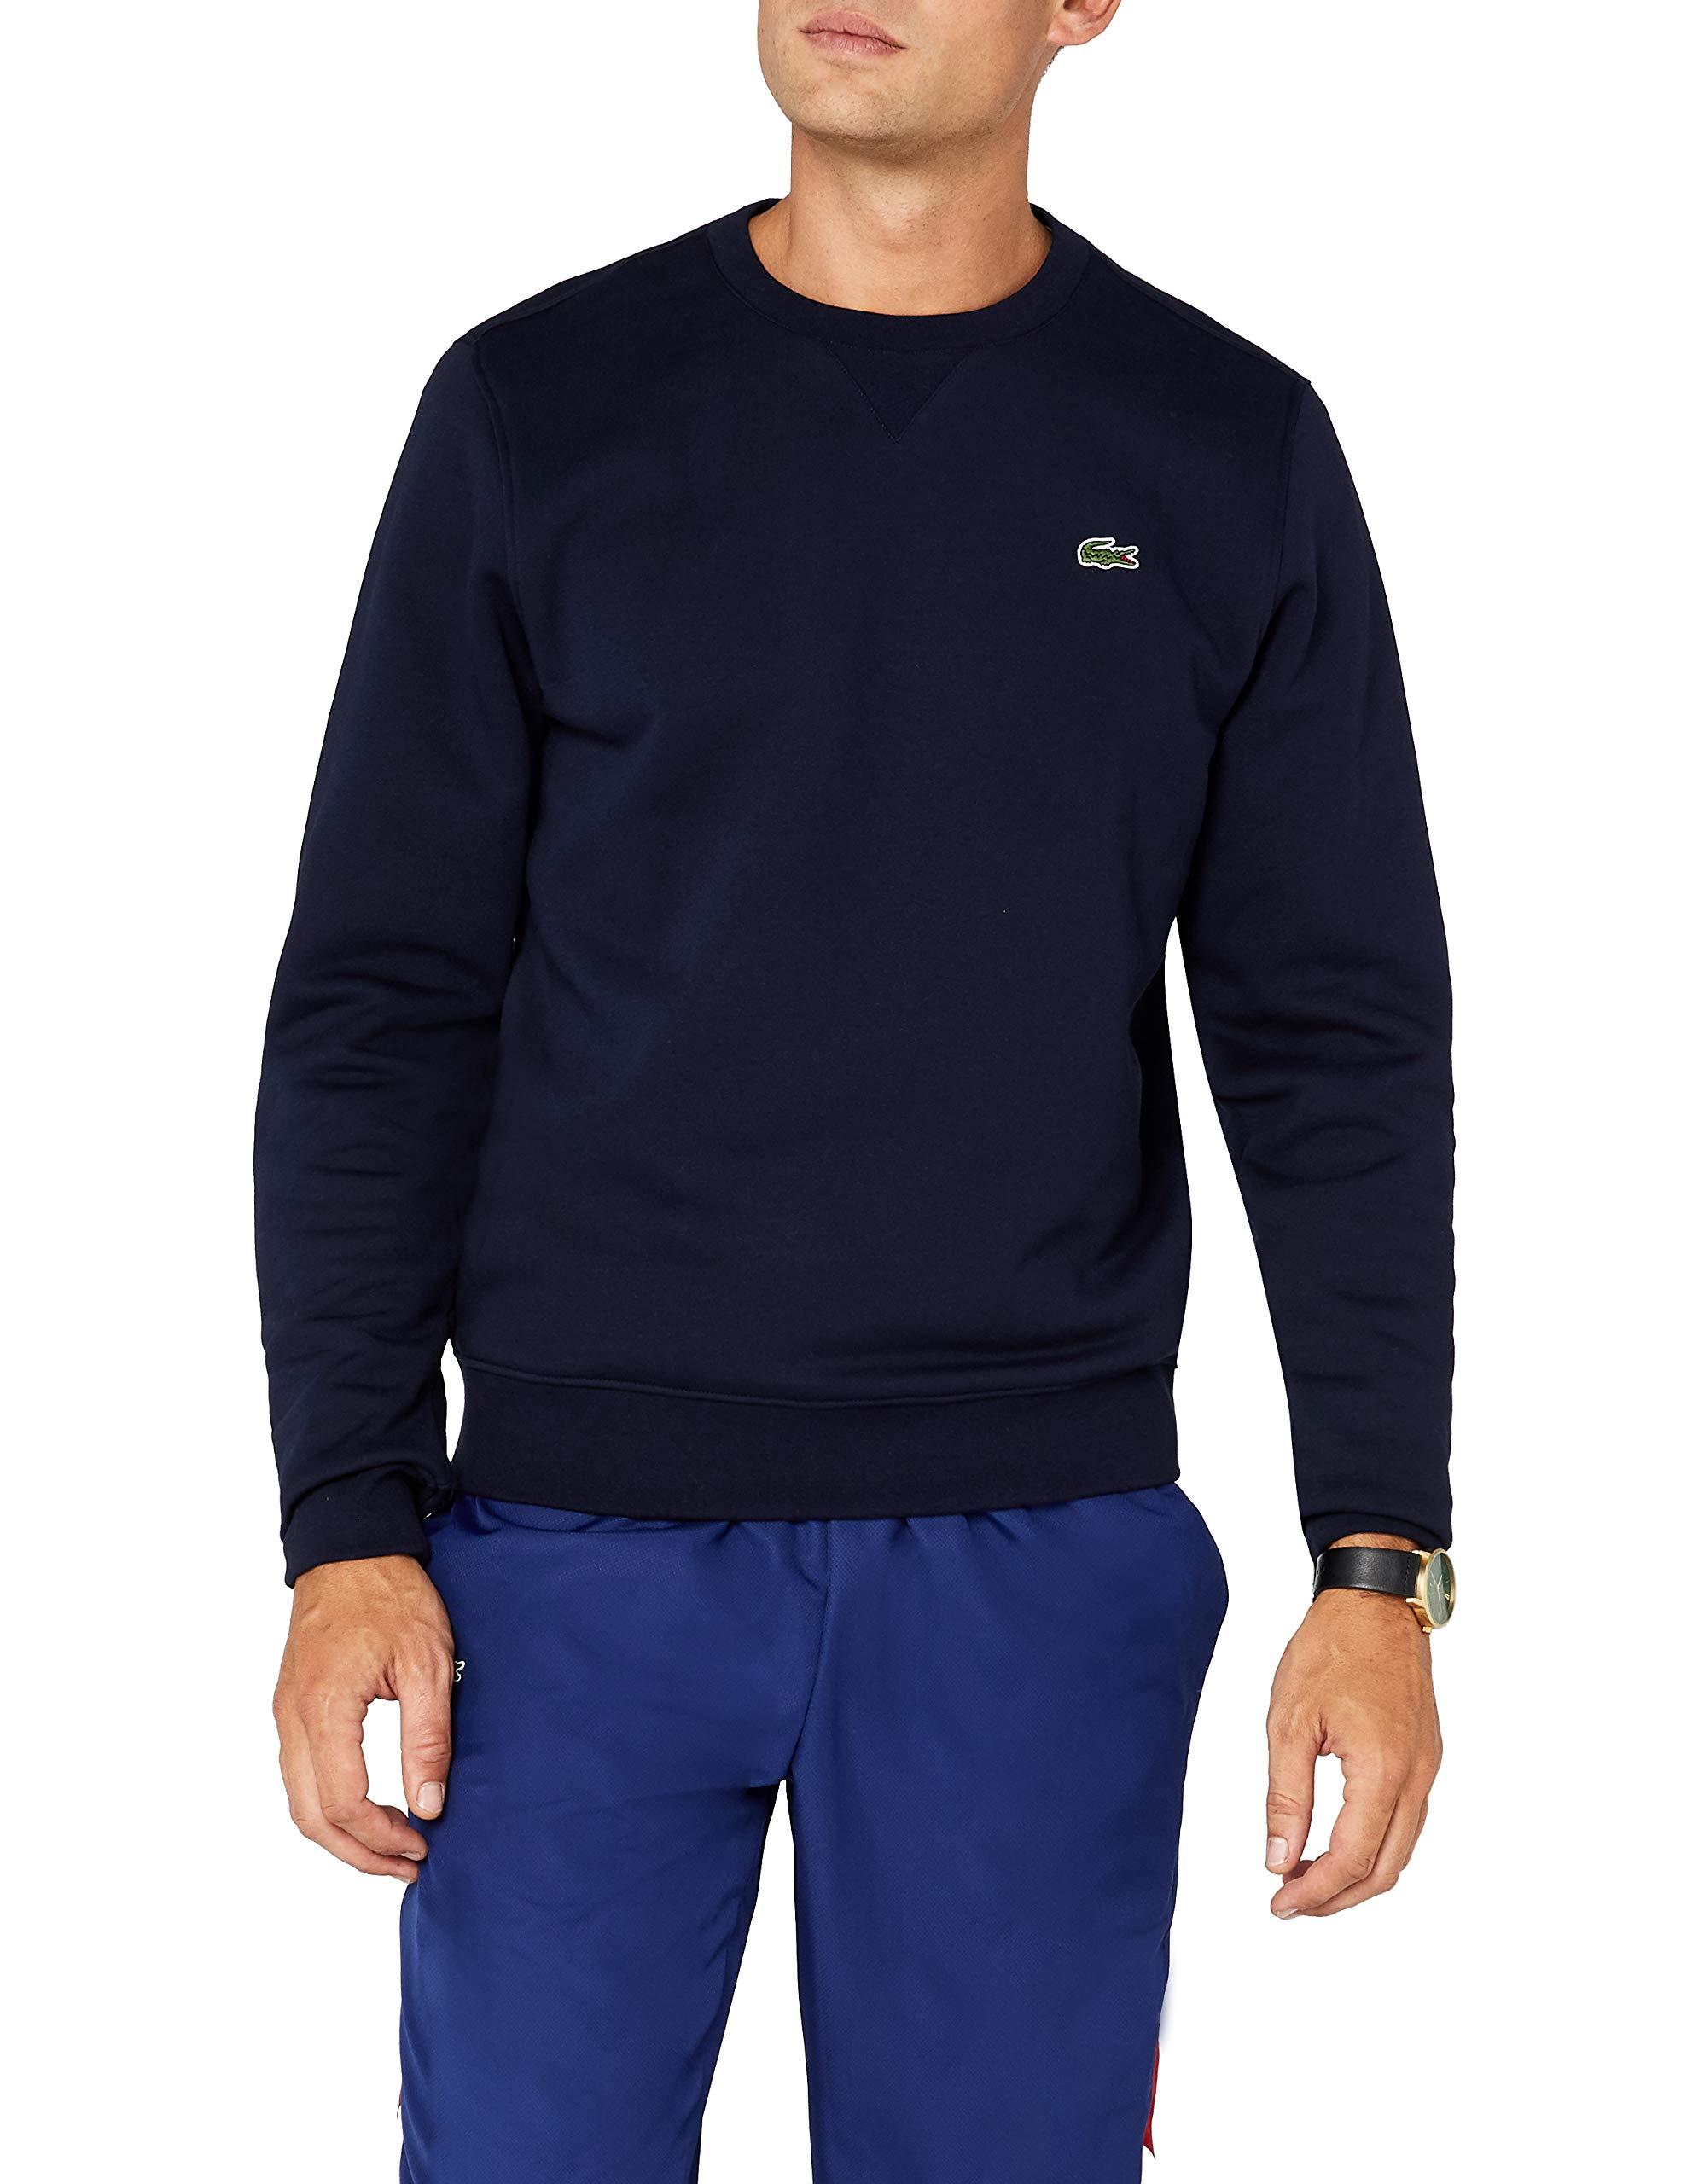 Top Sweat-shirts homme selon les notes Amazon.fr 74e0cce7f21a